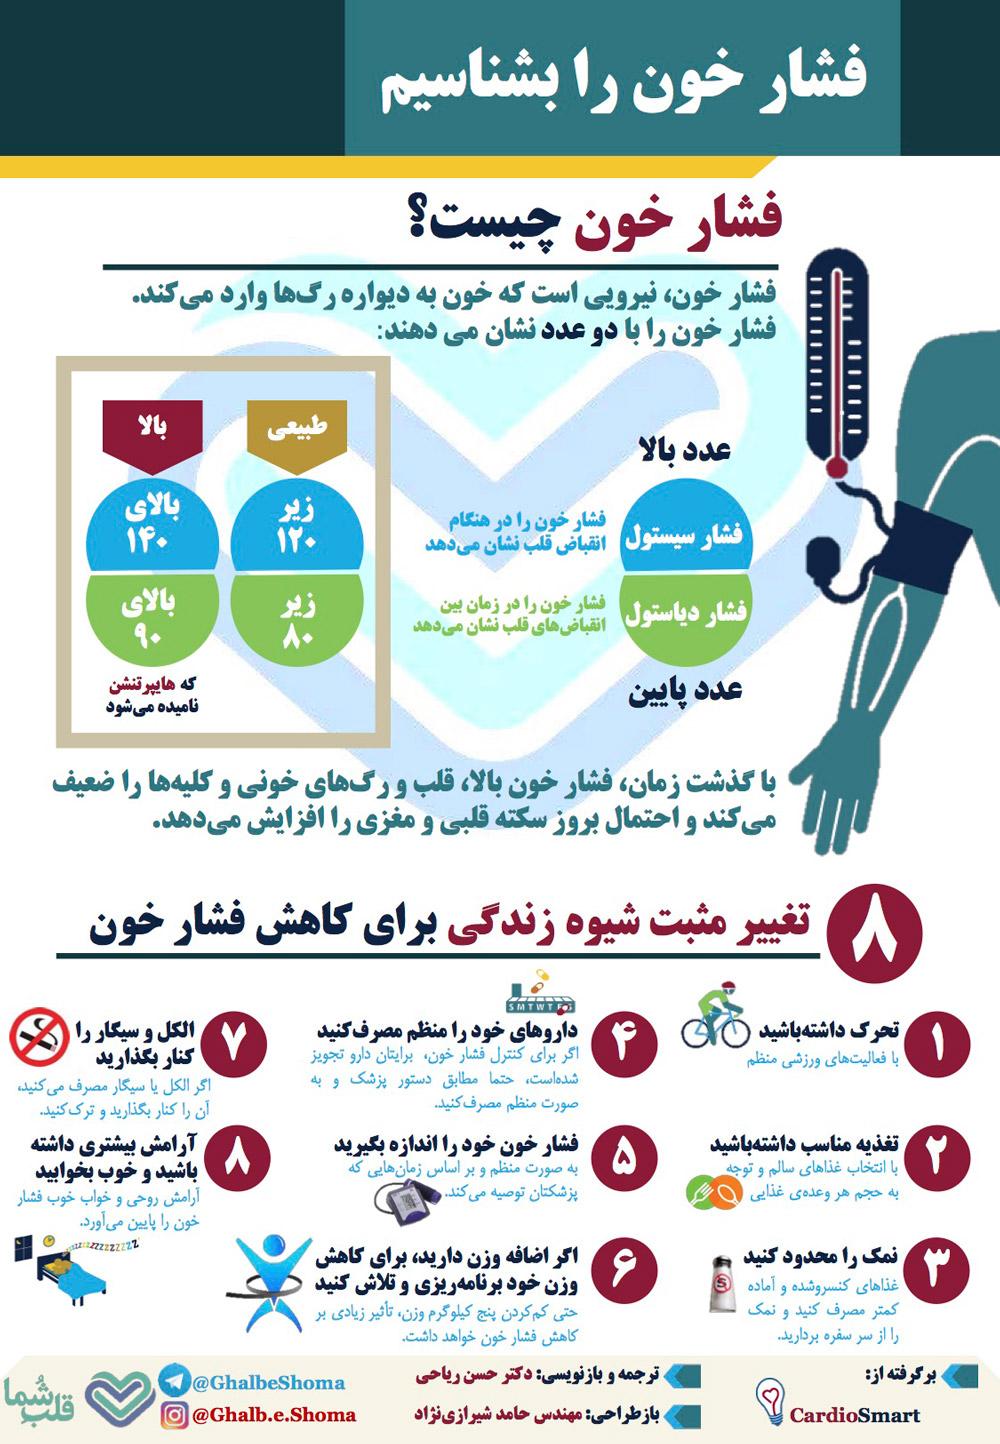 فشار خون را بشناسیم